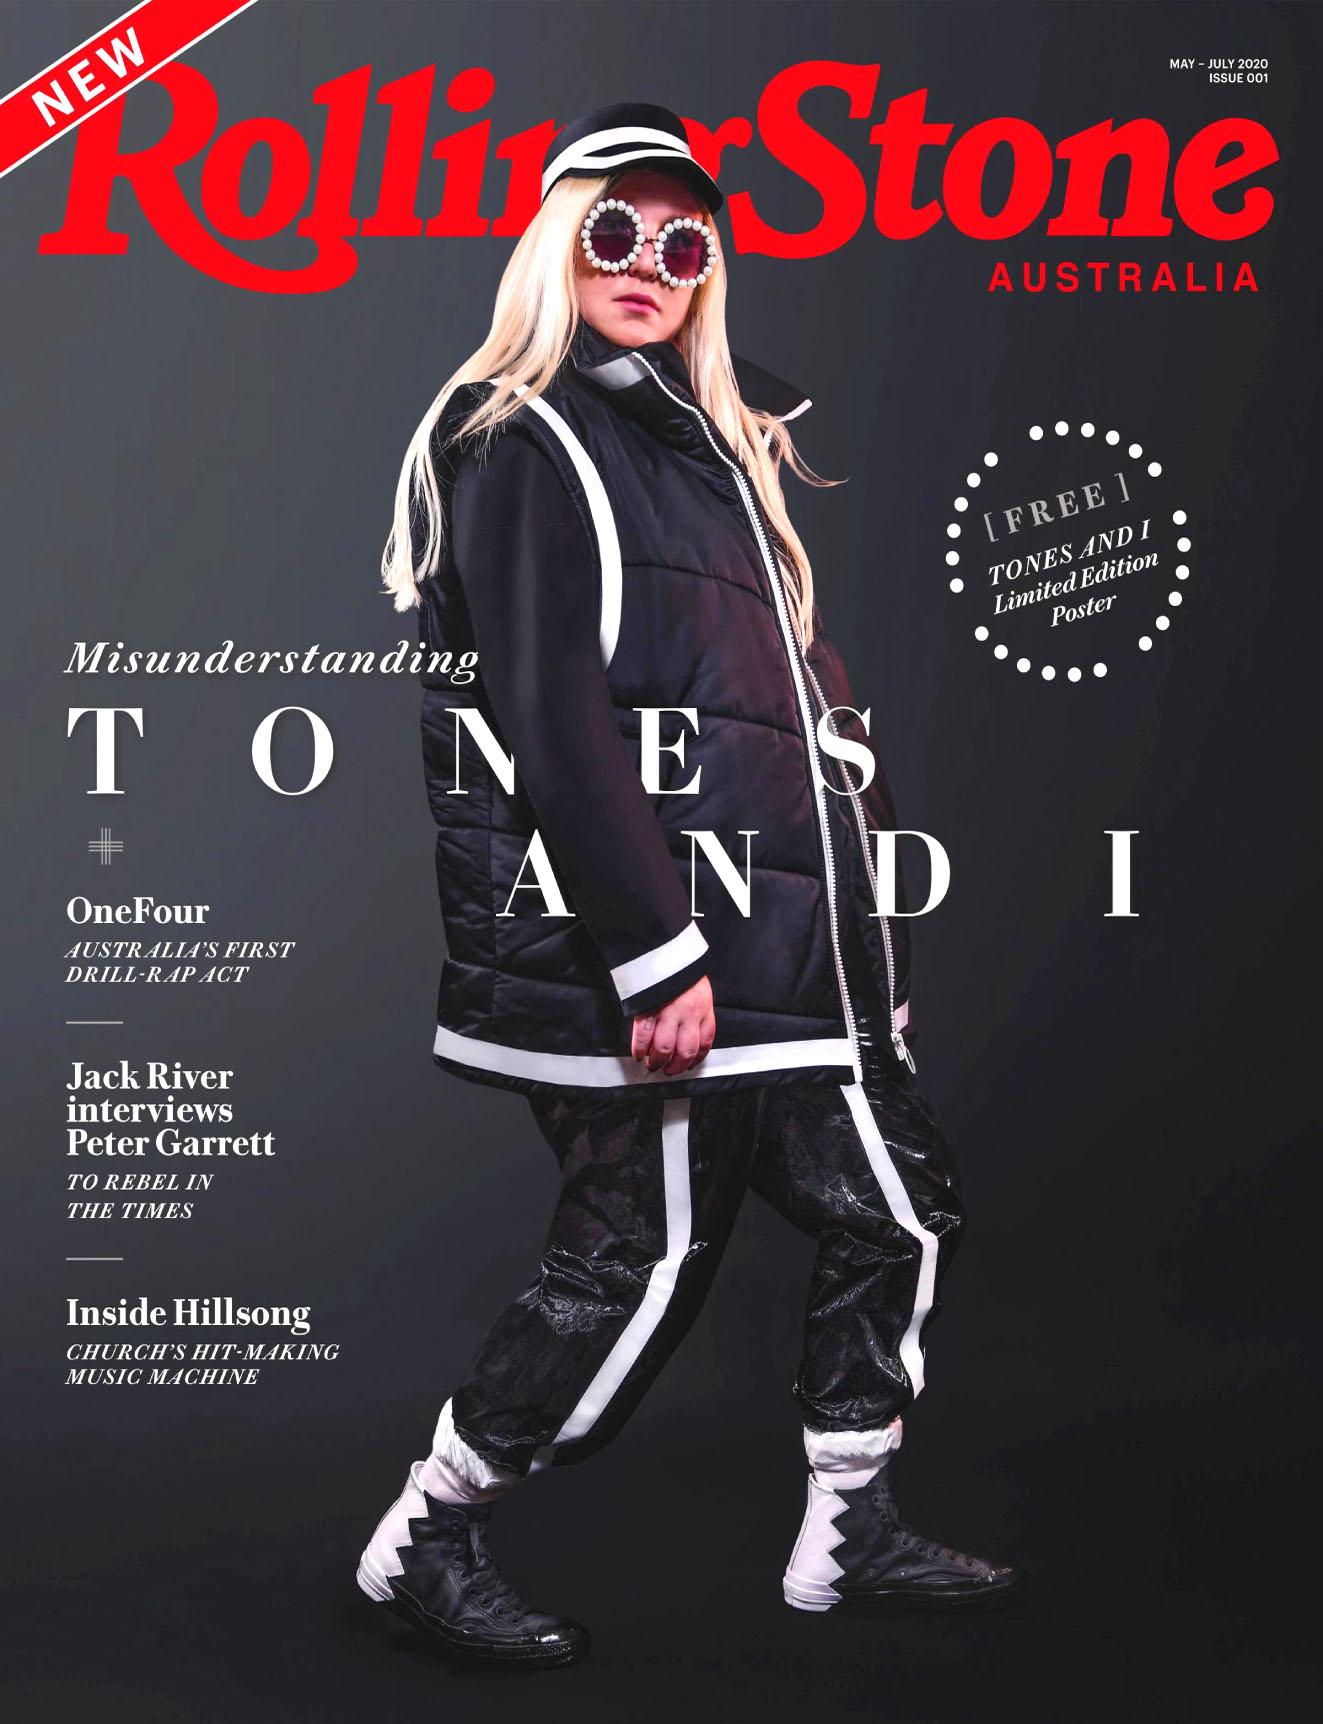 Rolling Stone Australia 001 2020-05-07001.jpg